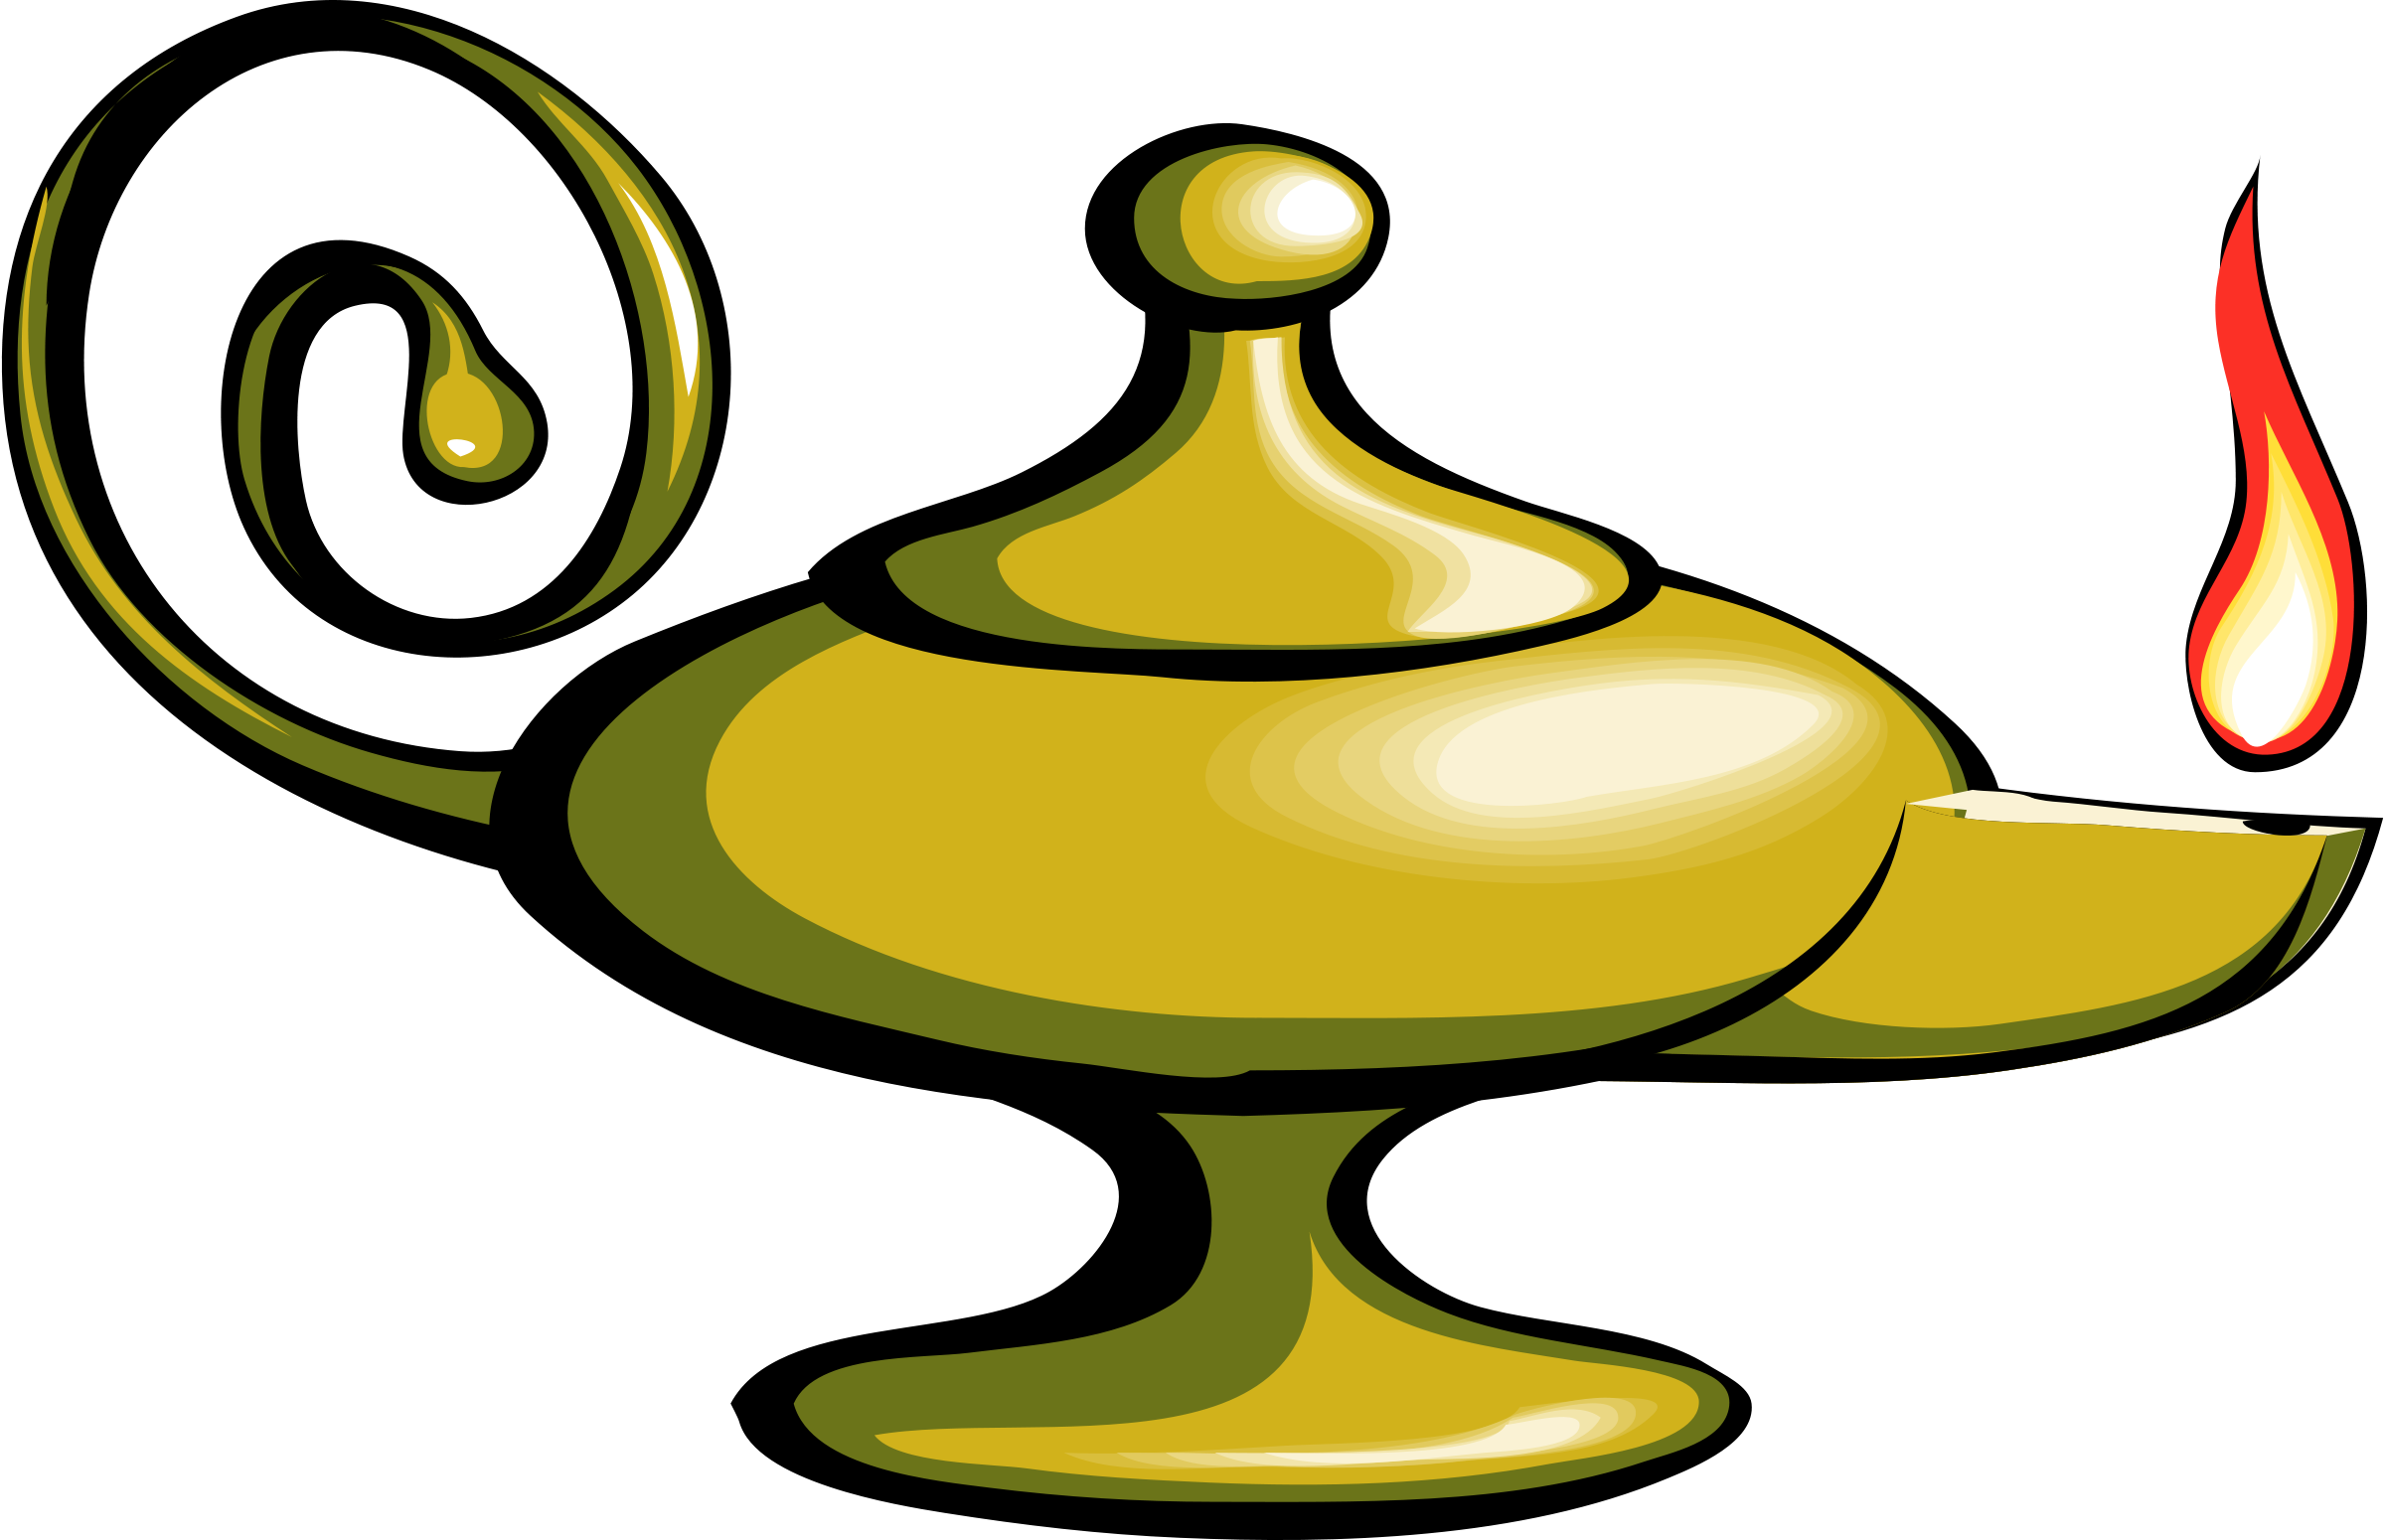 2400x1550 Aladdin Genie Lamp Clip Art